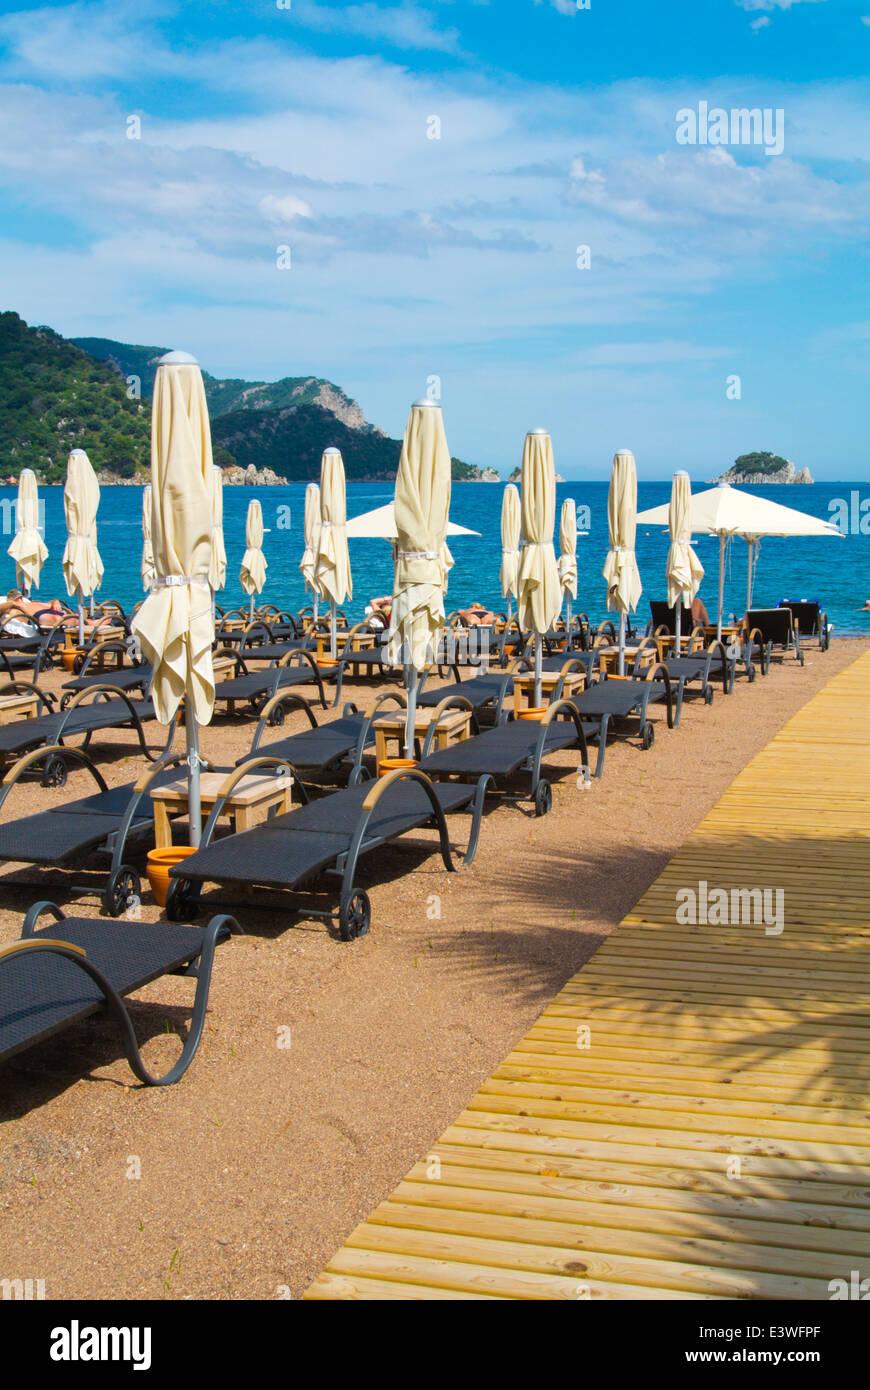 Sun loungers, beach, Icmeler resort, near Marmaris, Mugla province, Turkey, Asia Minor - Stock Image